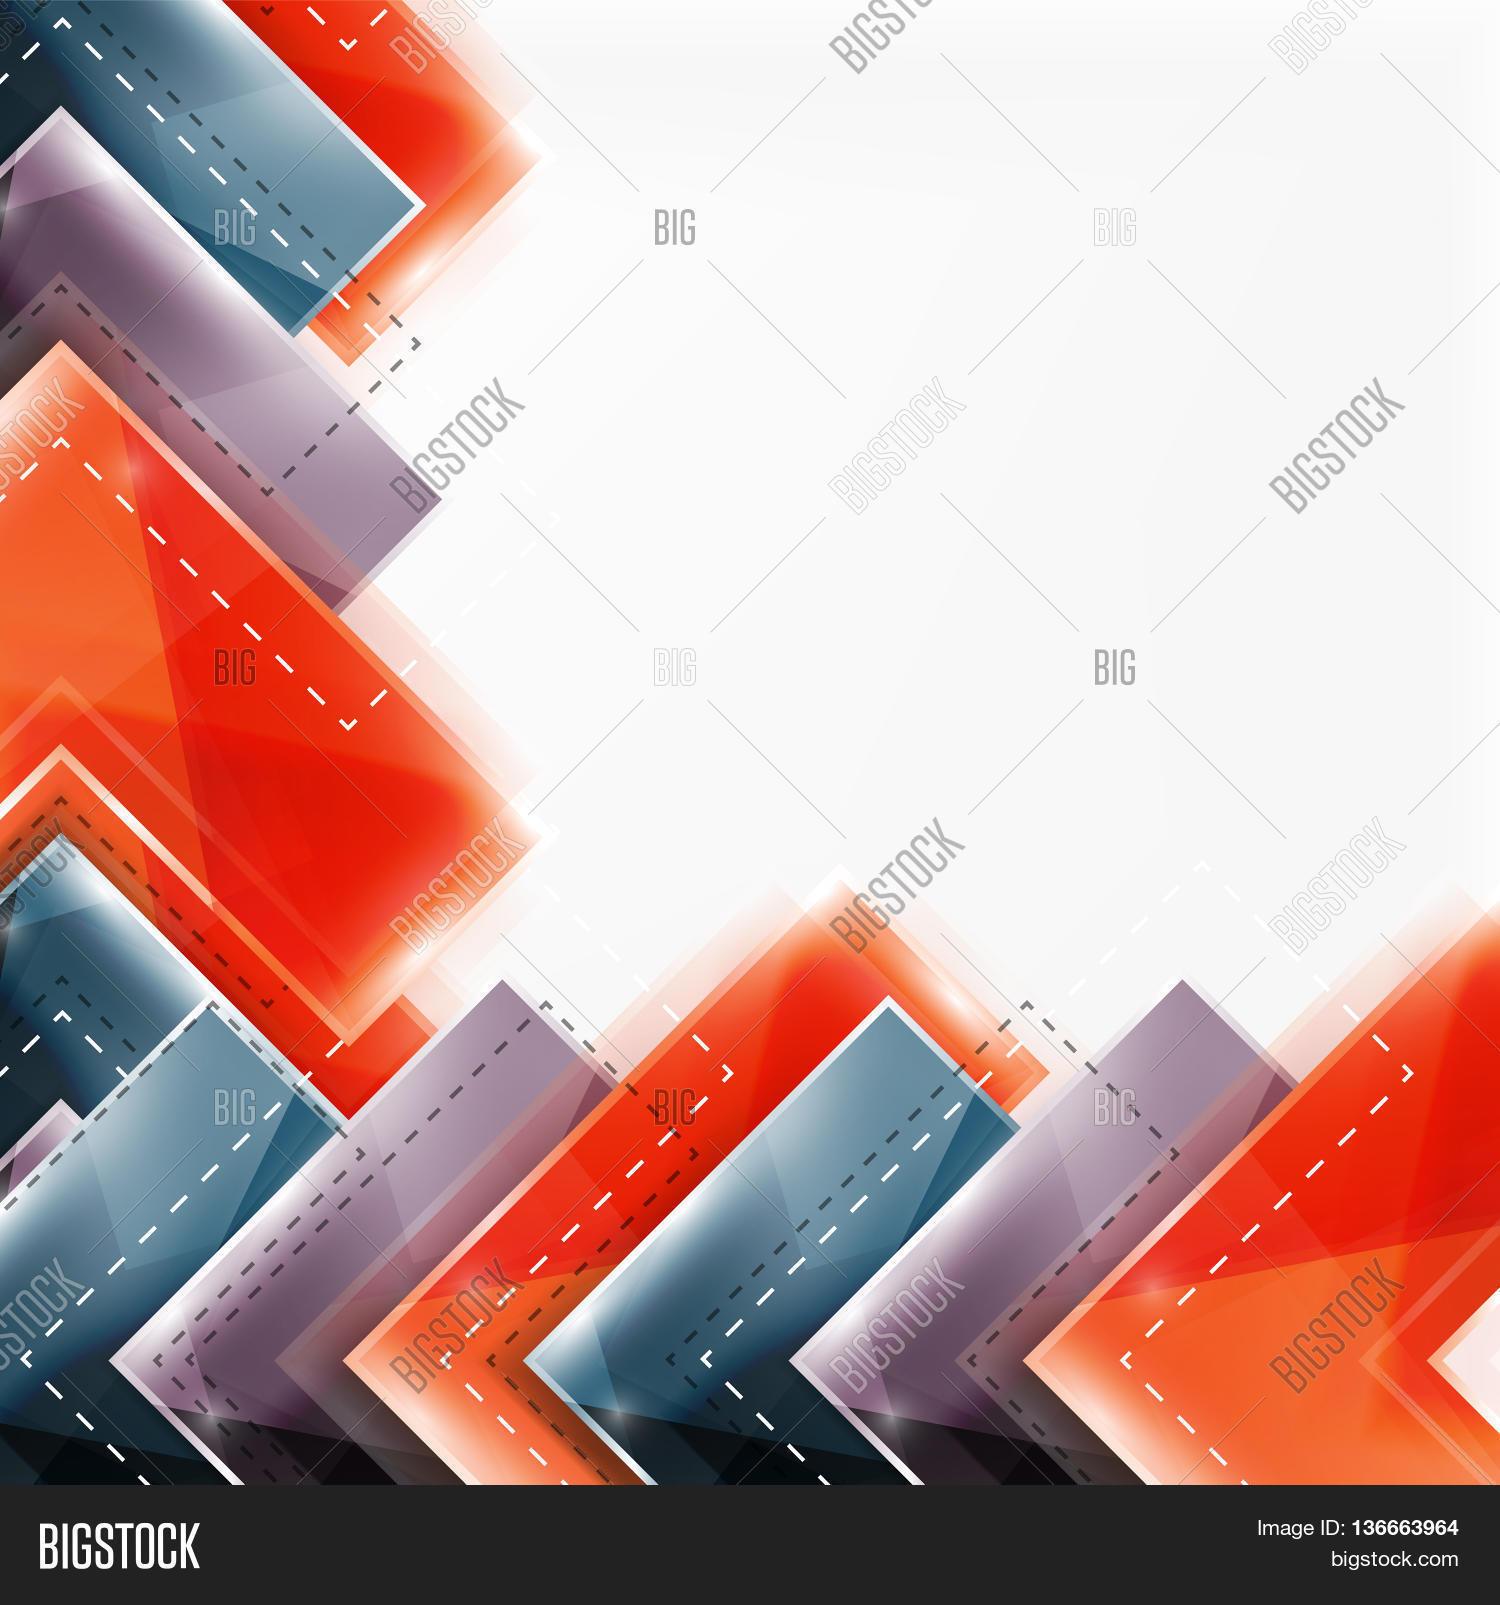 Colorful Glossy Arrow Image & Photo (Free Trial) | Bigstock